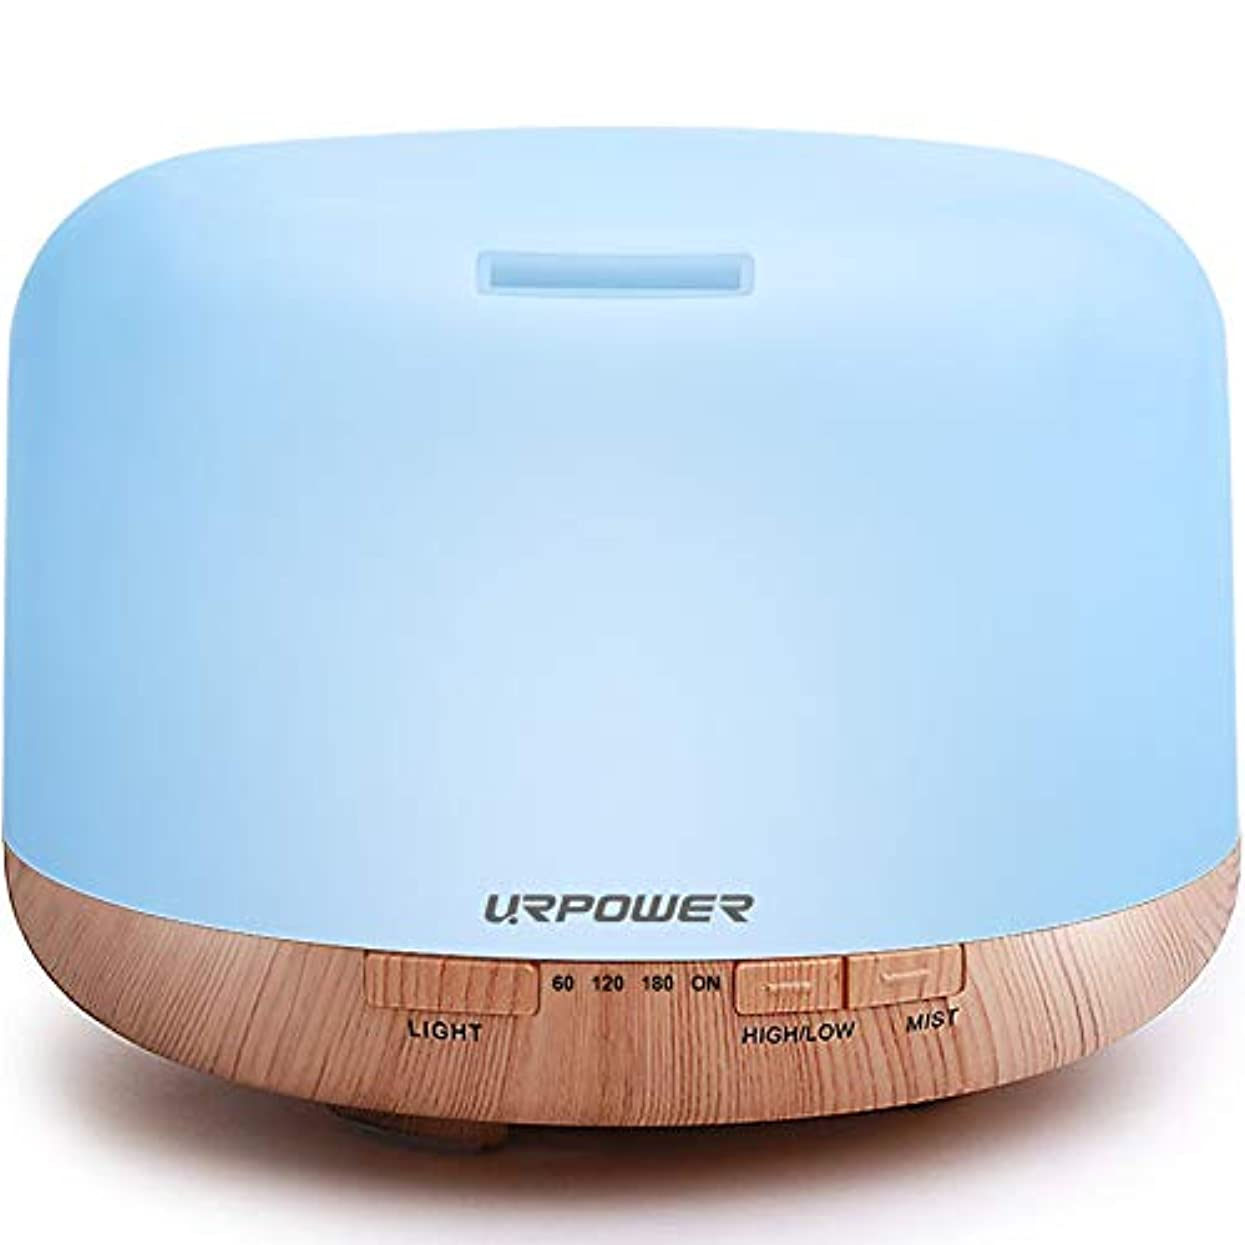 URPOWER アロマセラピー エッセンシャルオイルディフューザー 加湿器 ルームインテリア照明 500ミリリットル 4タイマー設定 7色変化LEDランプ 無水自動遮断 ホワイト OD-501